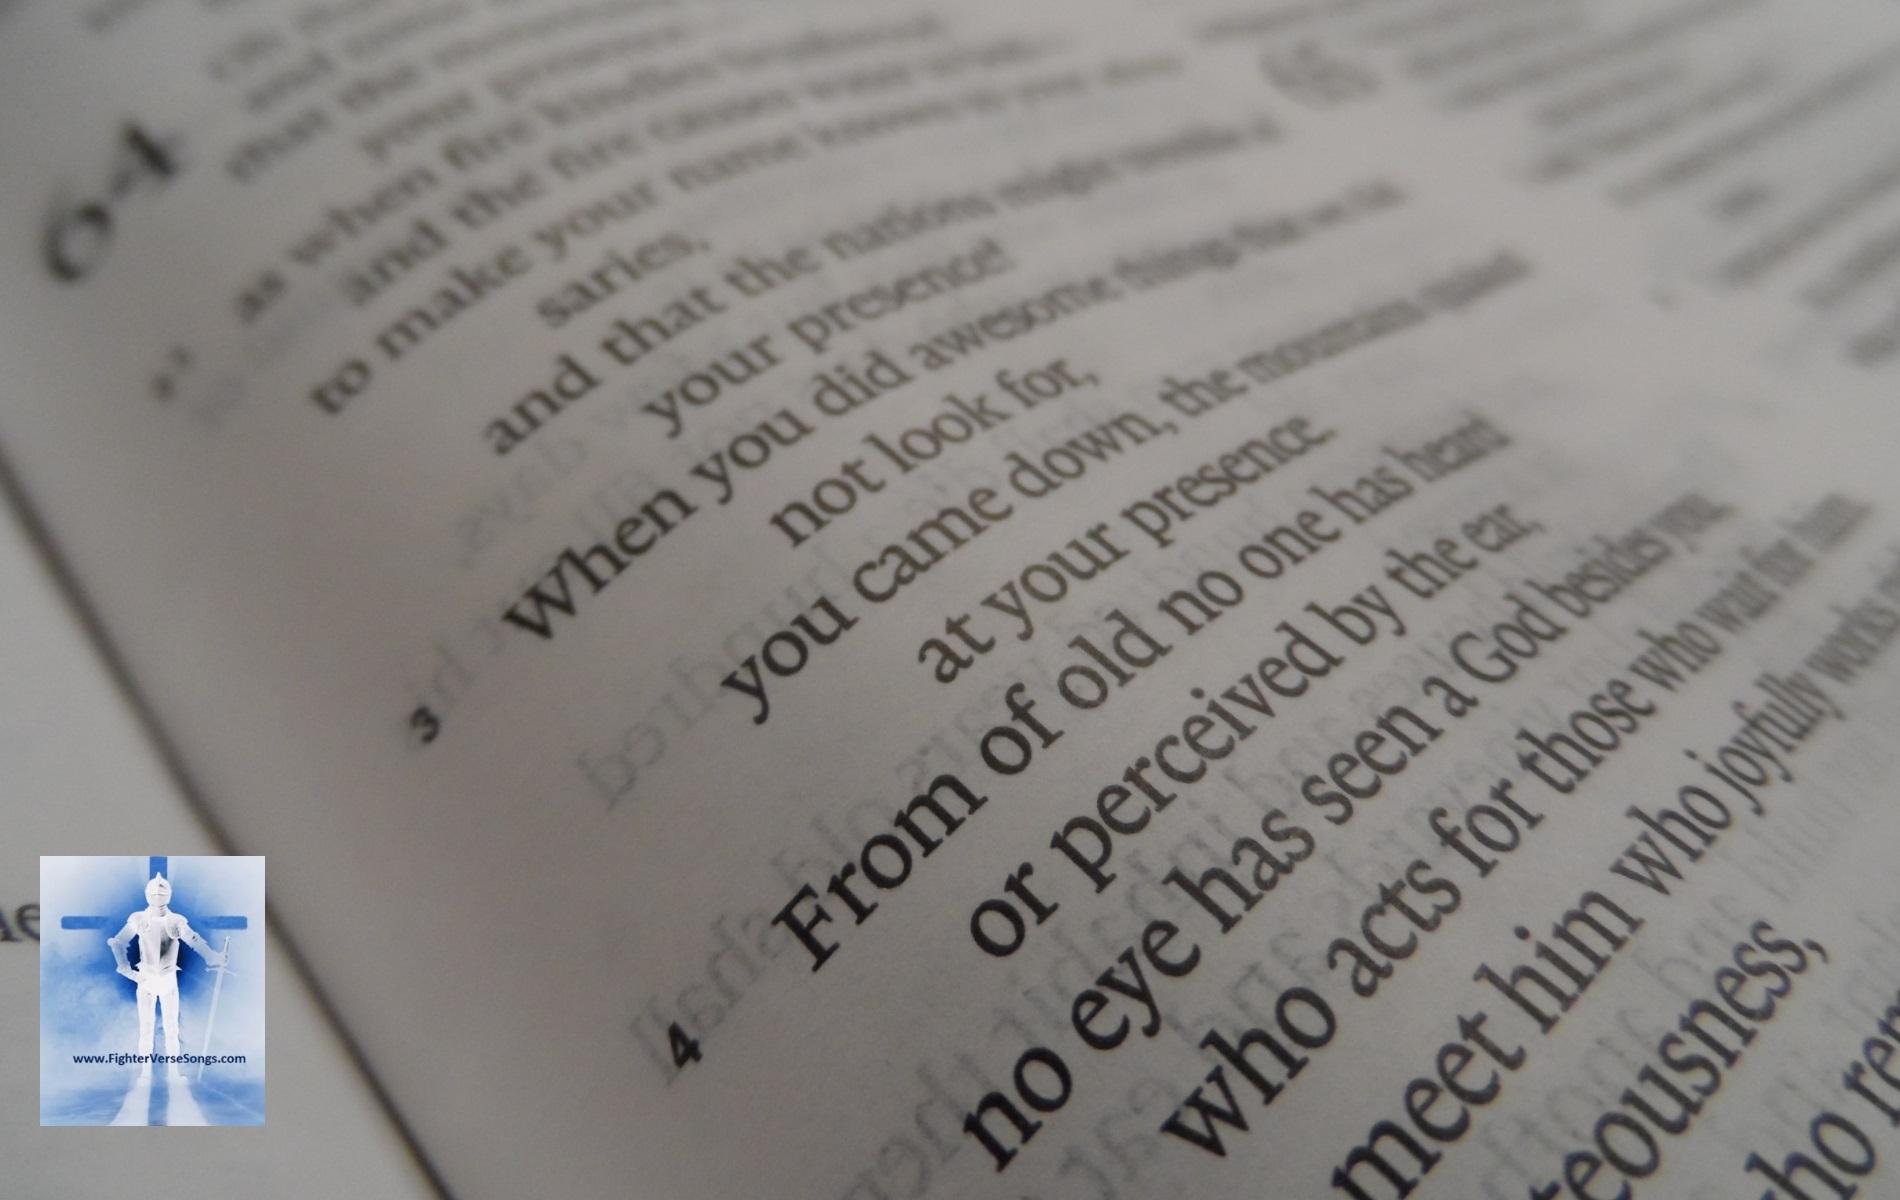 Isaiah 64:4